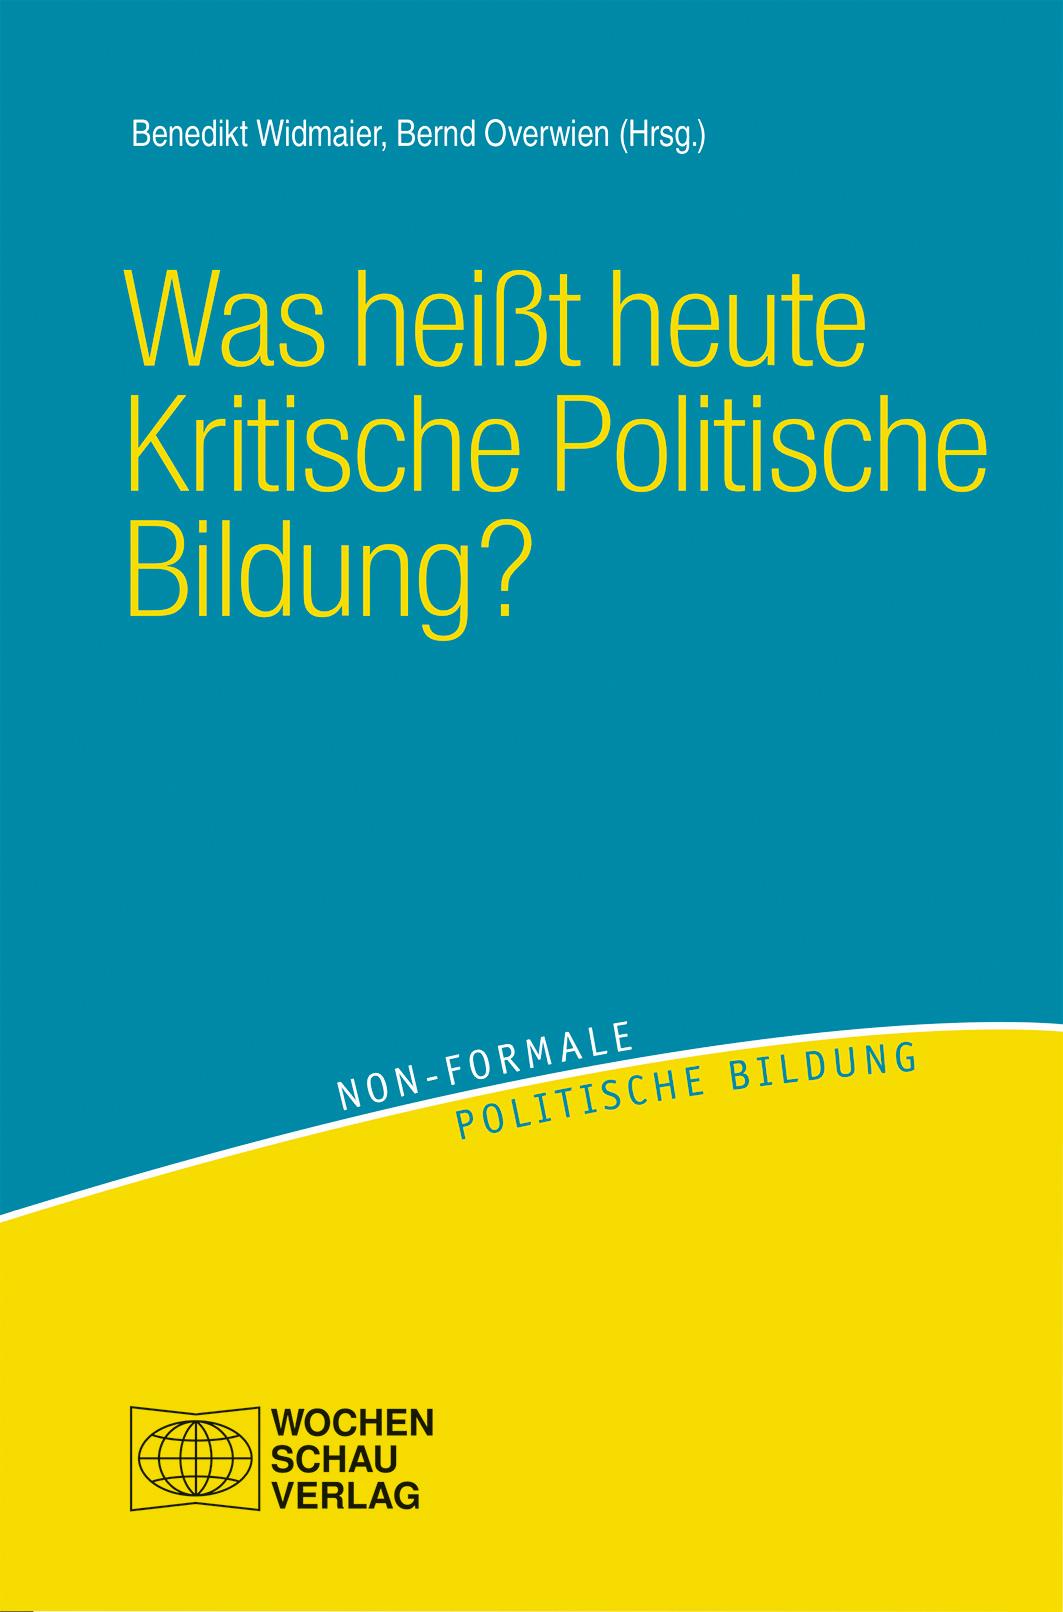 Was heißt heute Kritische Politische Bildung?